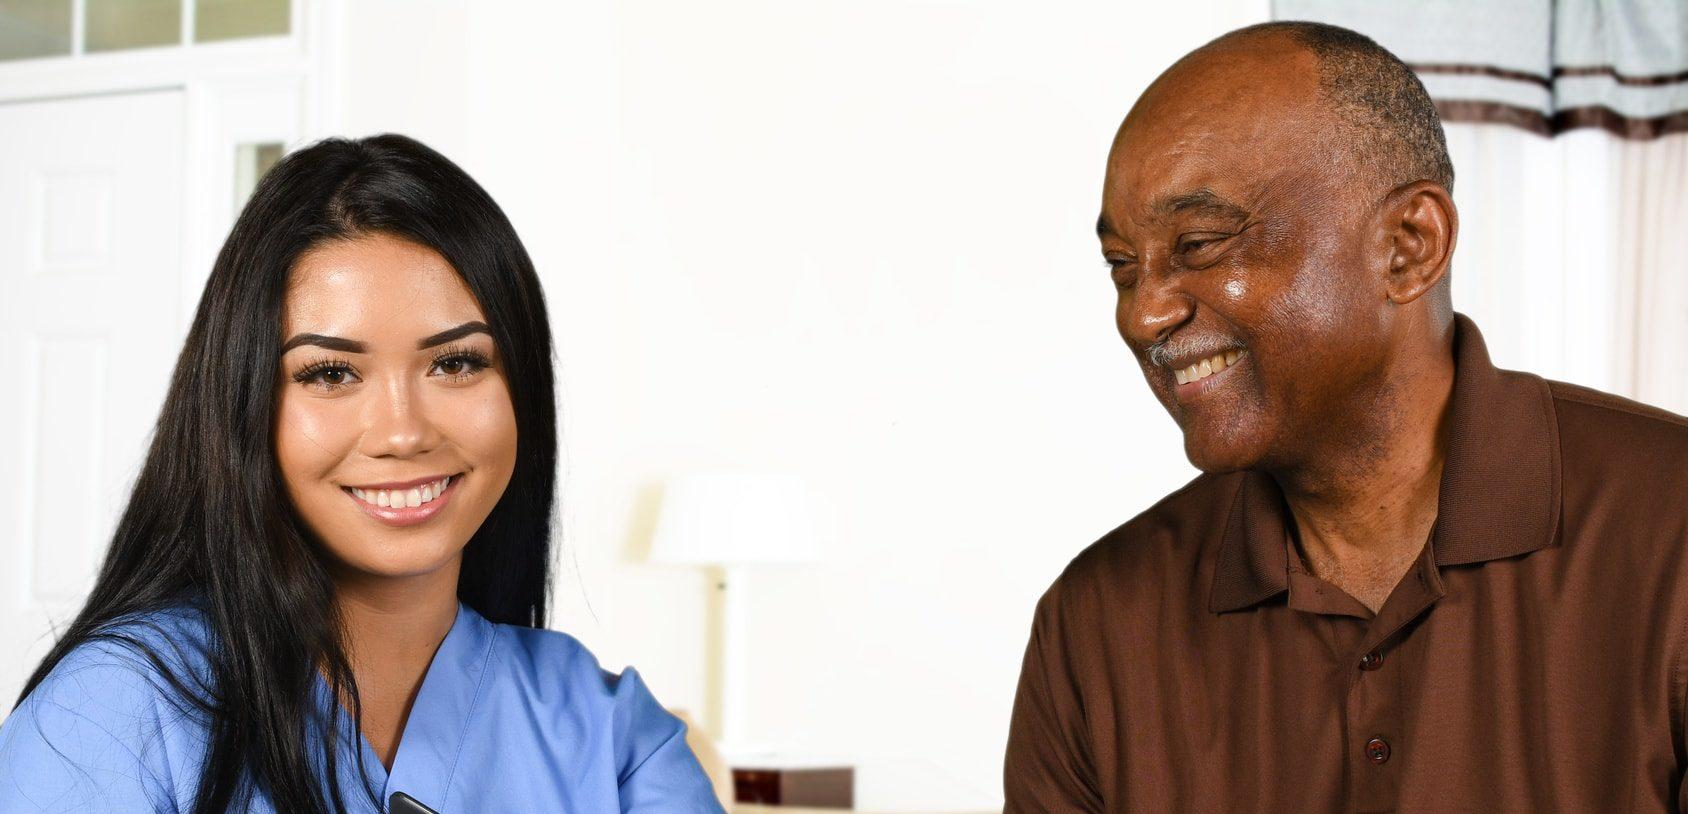 open door home care senior care nurse with a patient